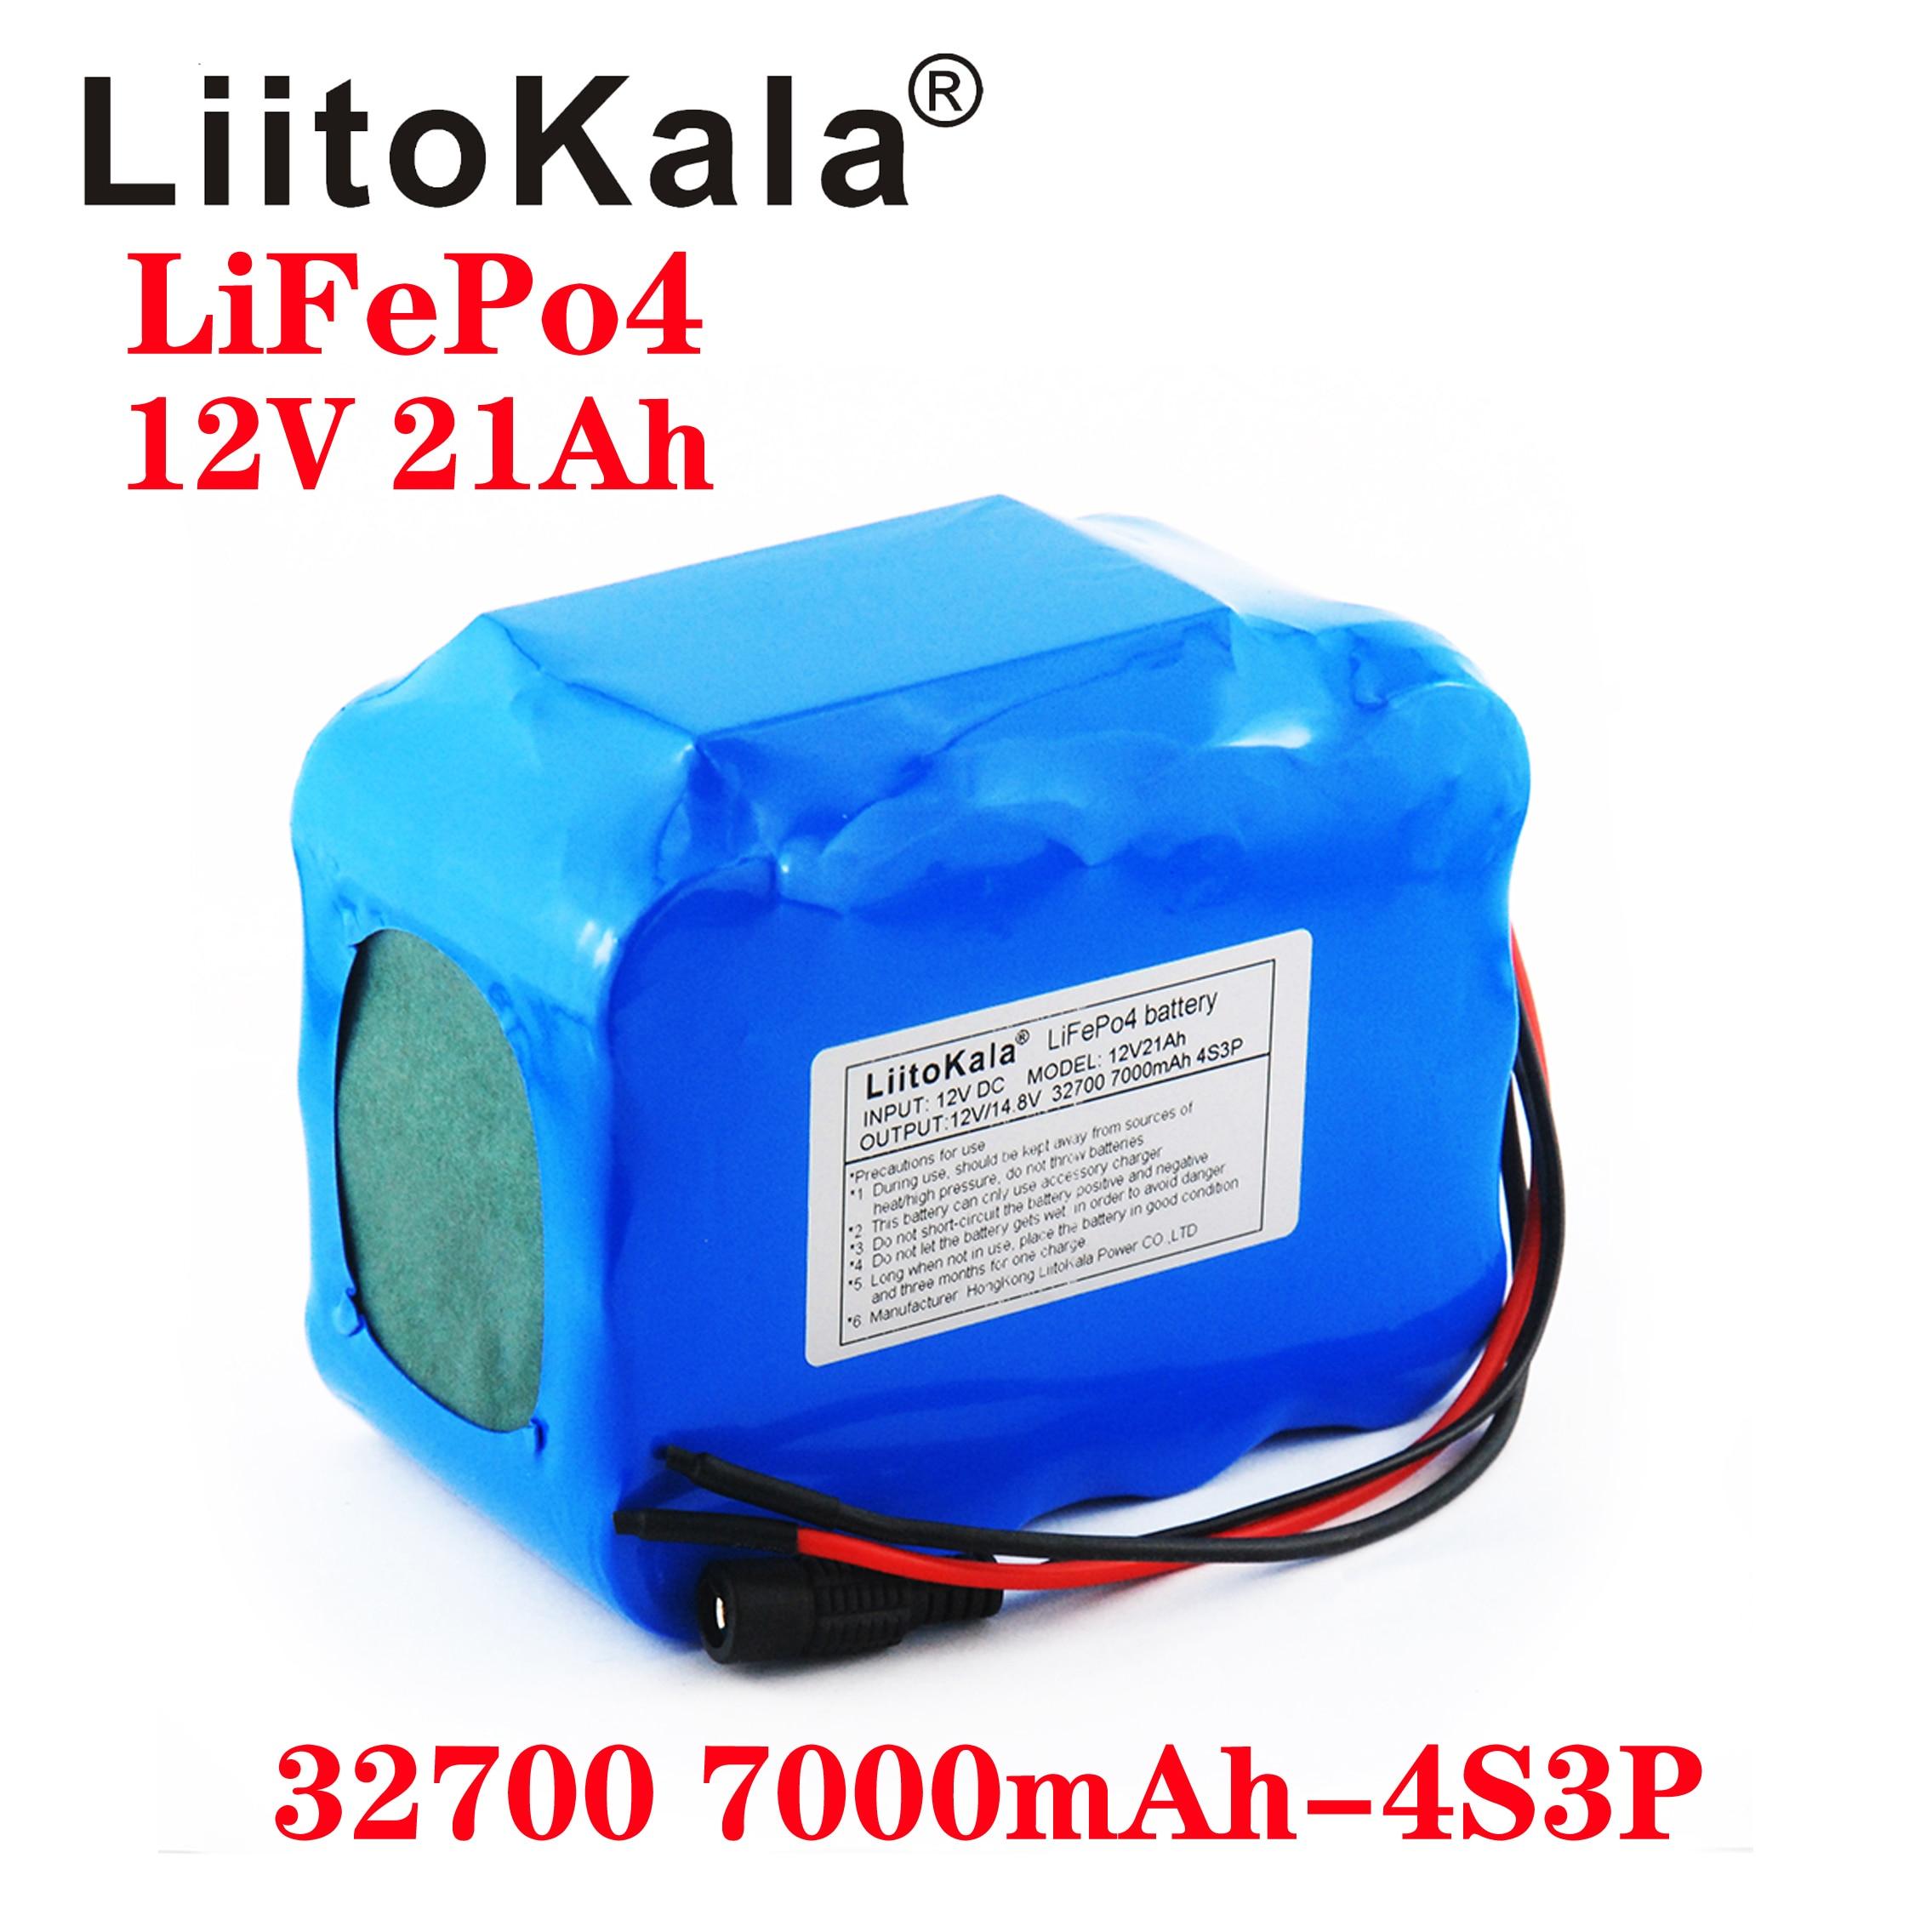 LiitoKala 32700 Lifepo4 بطارية حزمة 4S3P 12.8V 21Ah مع 4S 20A أقصى 60A متوازن BMS ل قارب كهربائي الطاقة دون انقطاع